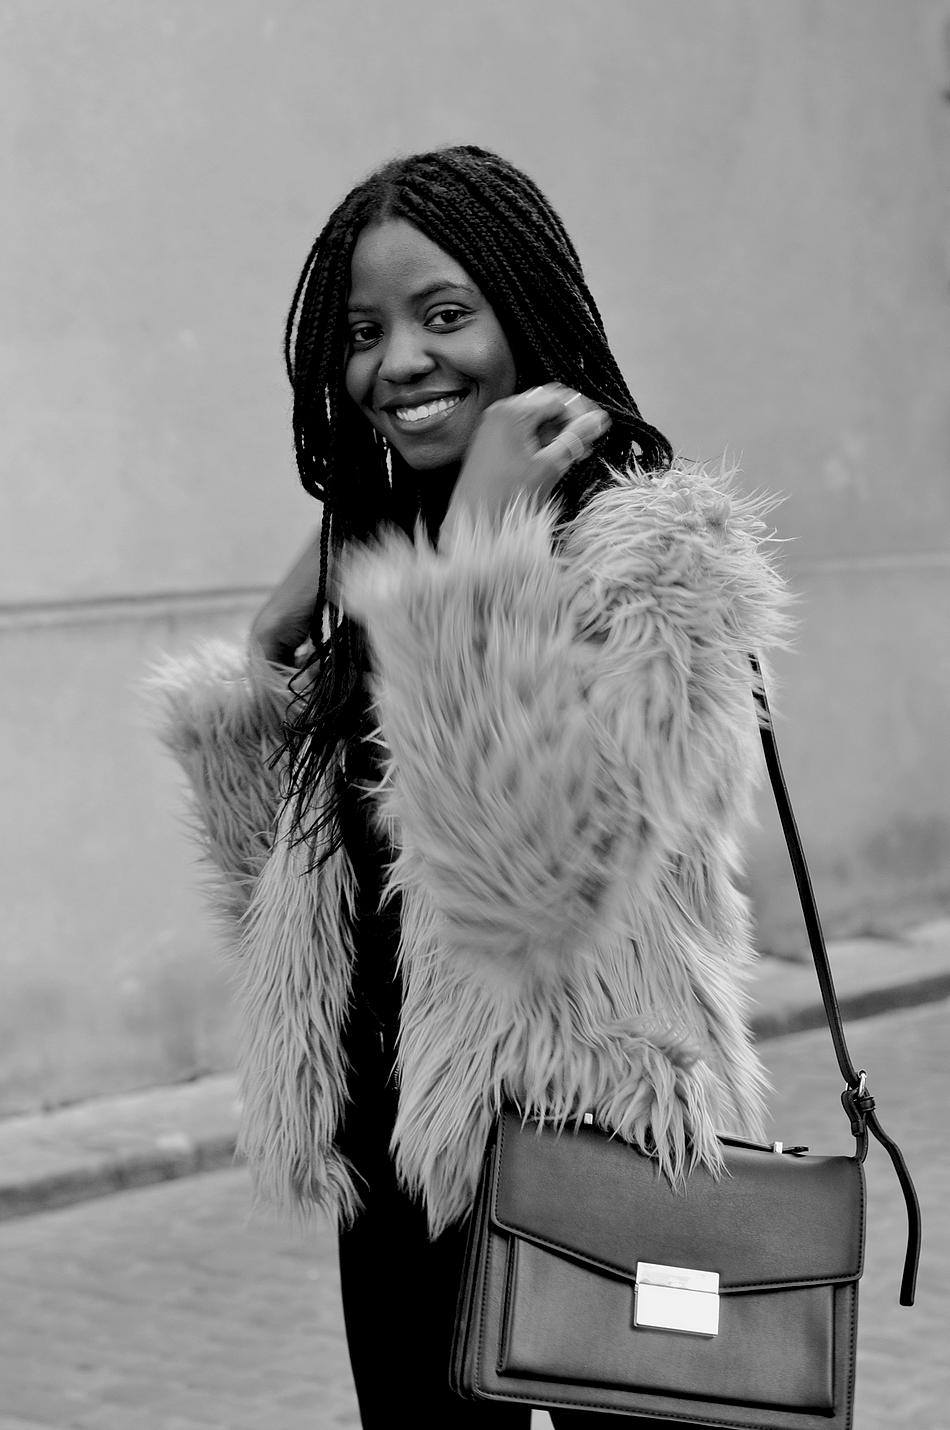 bordeaux, blog mode bordeaux, blogueuse bordelaise, blogueuse mode bordelaise, blogueuse noire, black fashion blogger, blog mode bordelais, olivia blog, blogueuse olivia